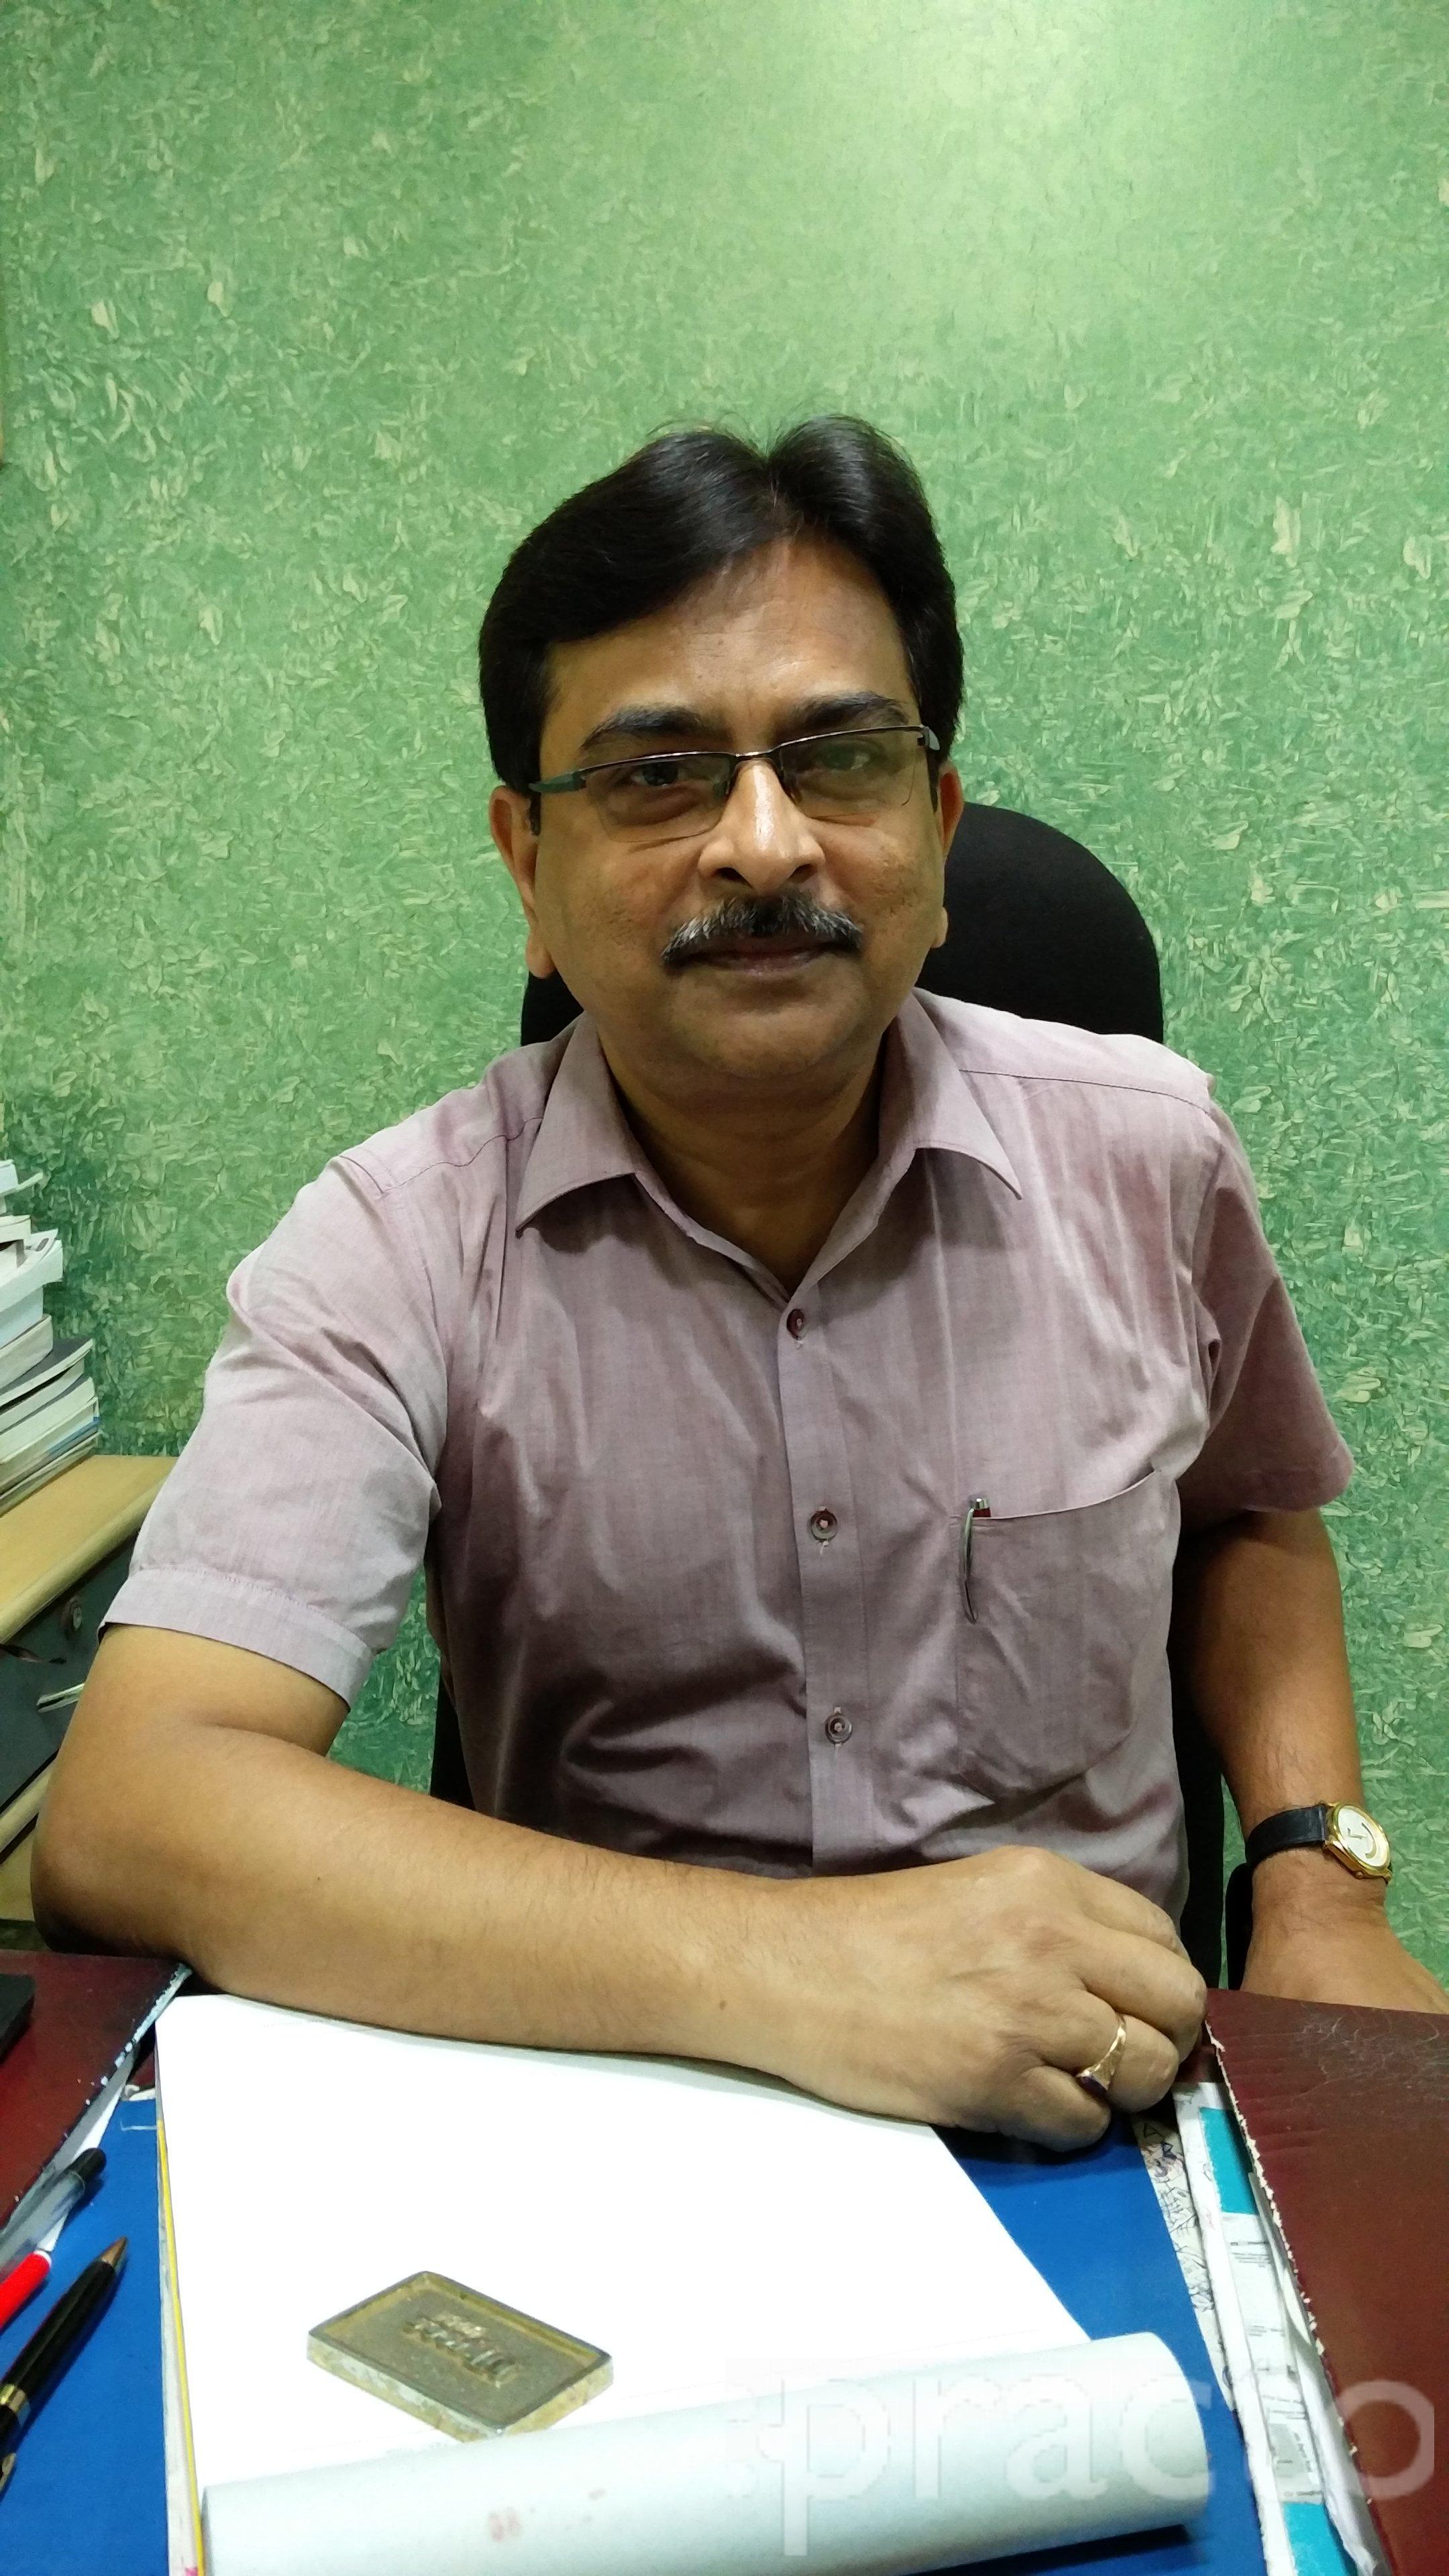 Dr. Manas Kundu - Gynecologist/Obstetrician